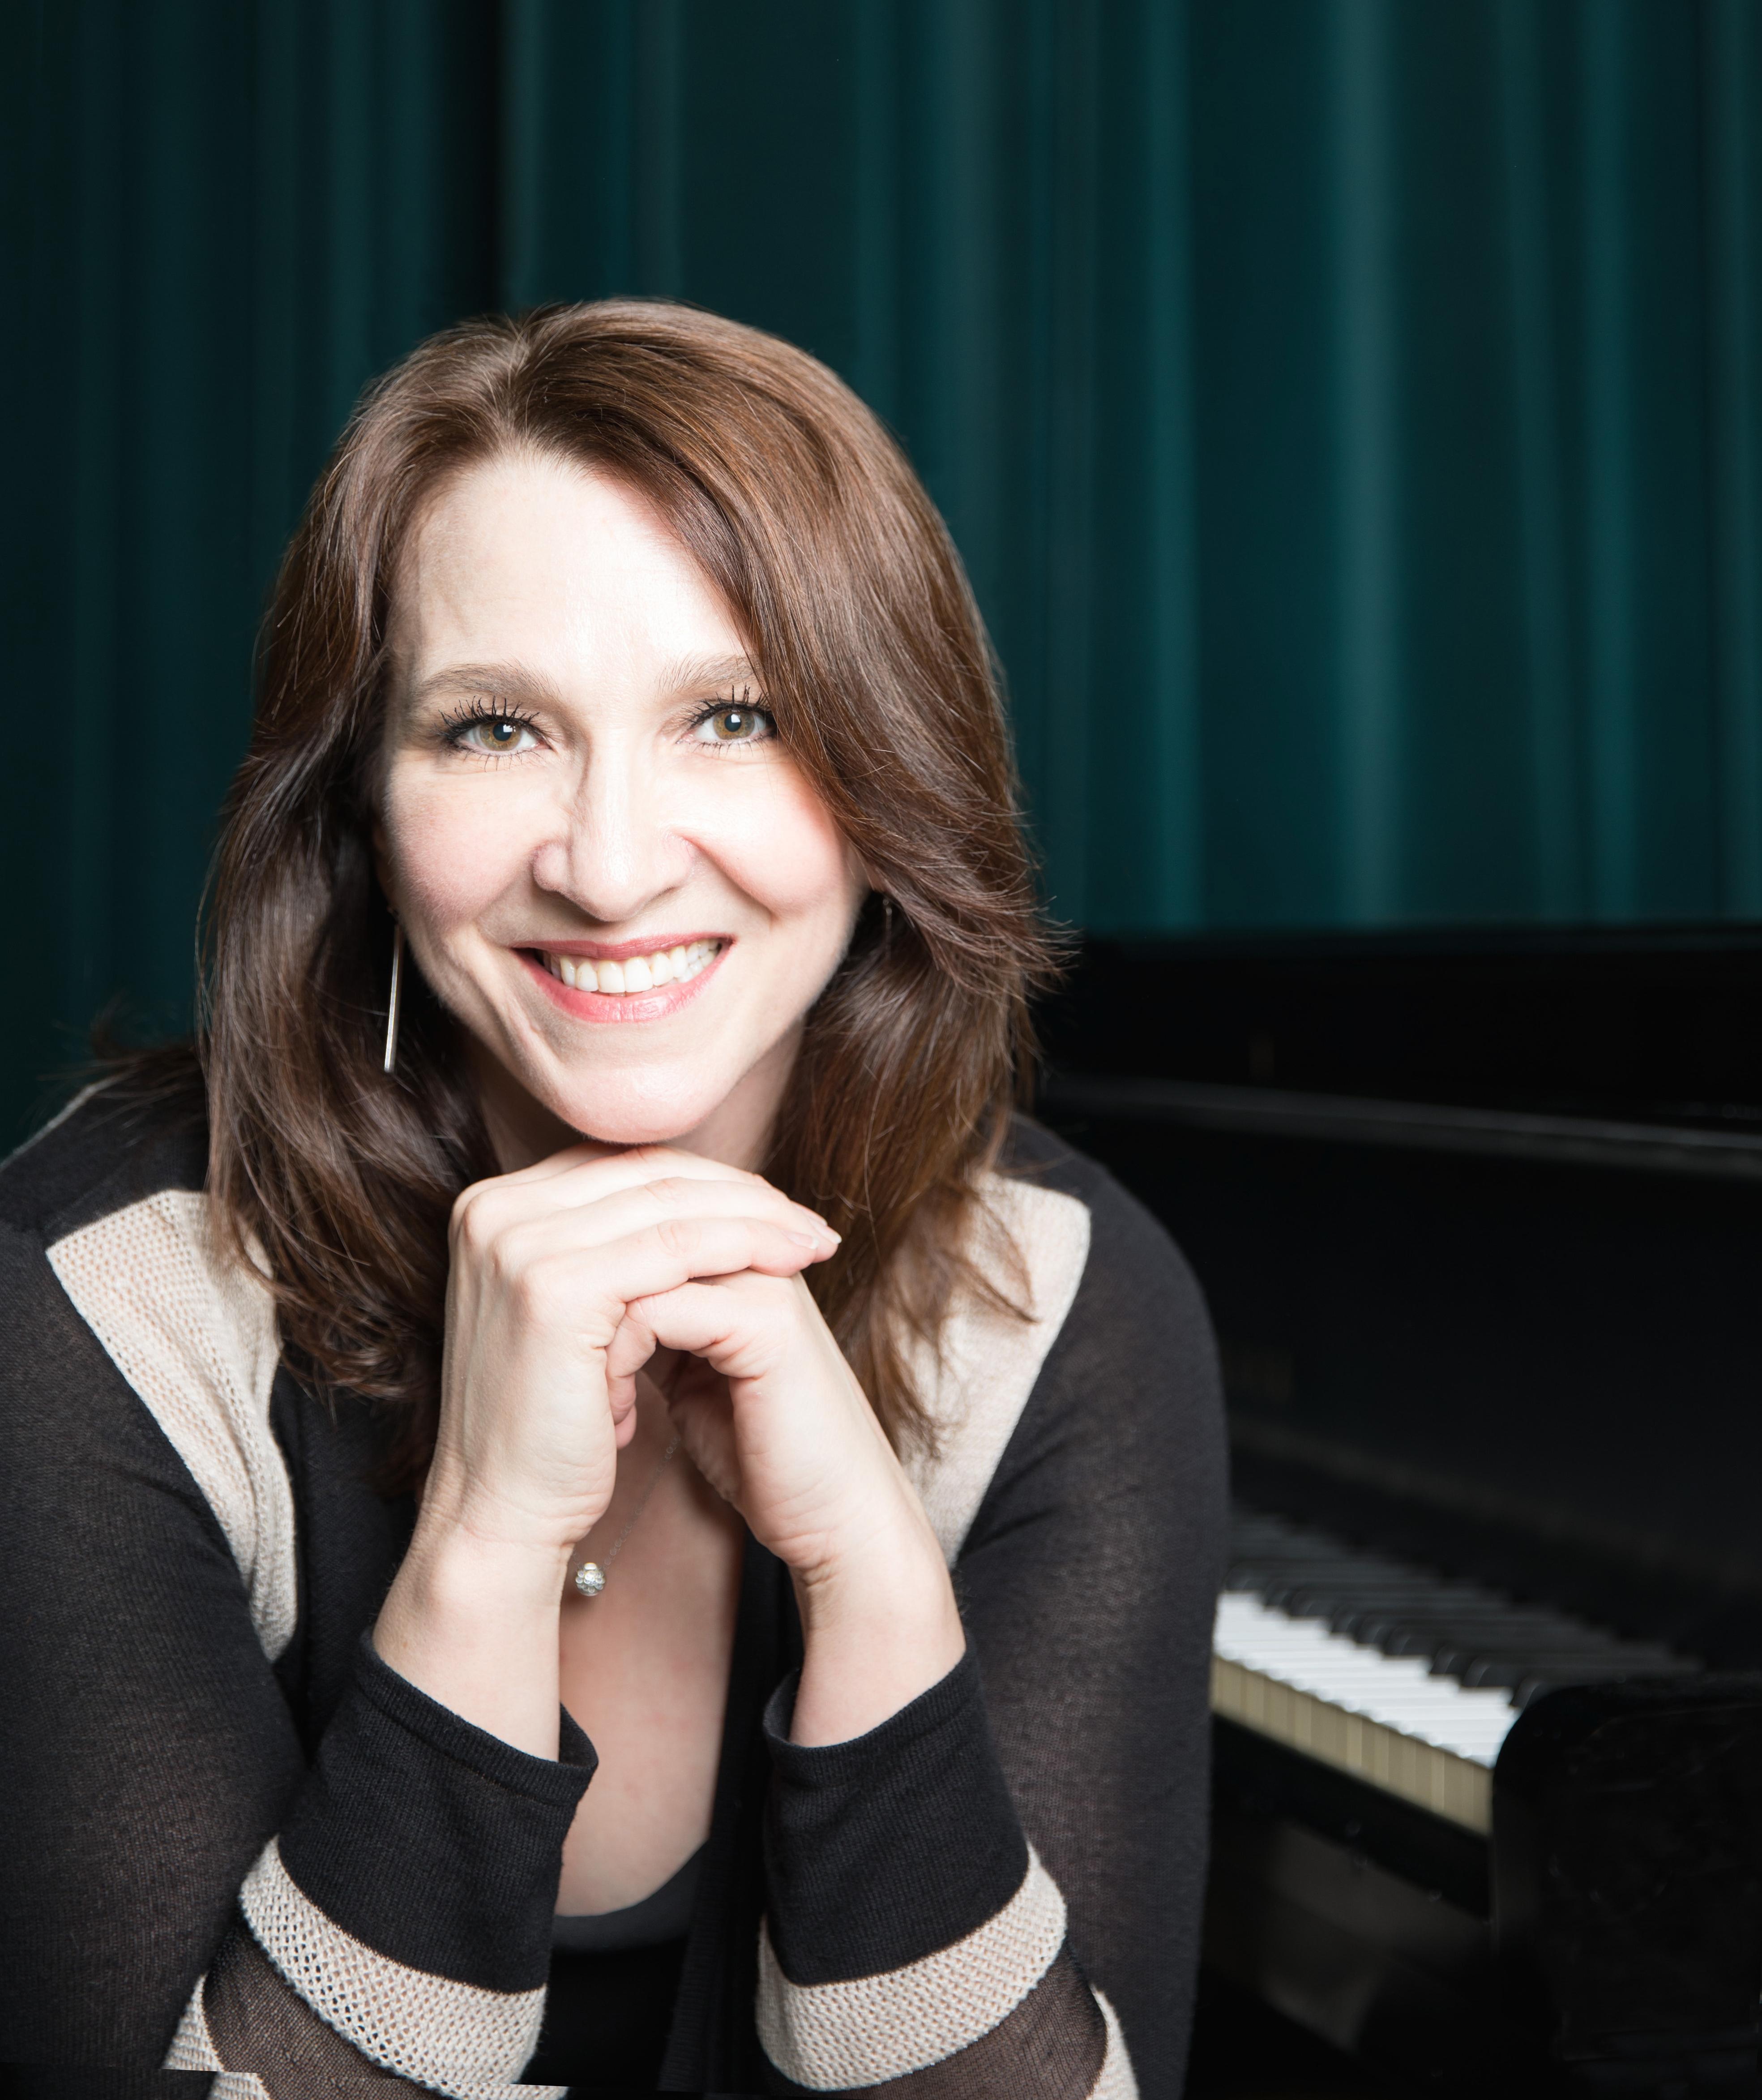 Christine Guter